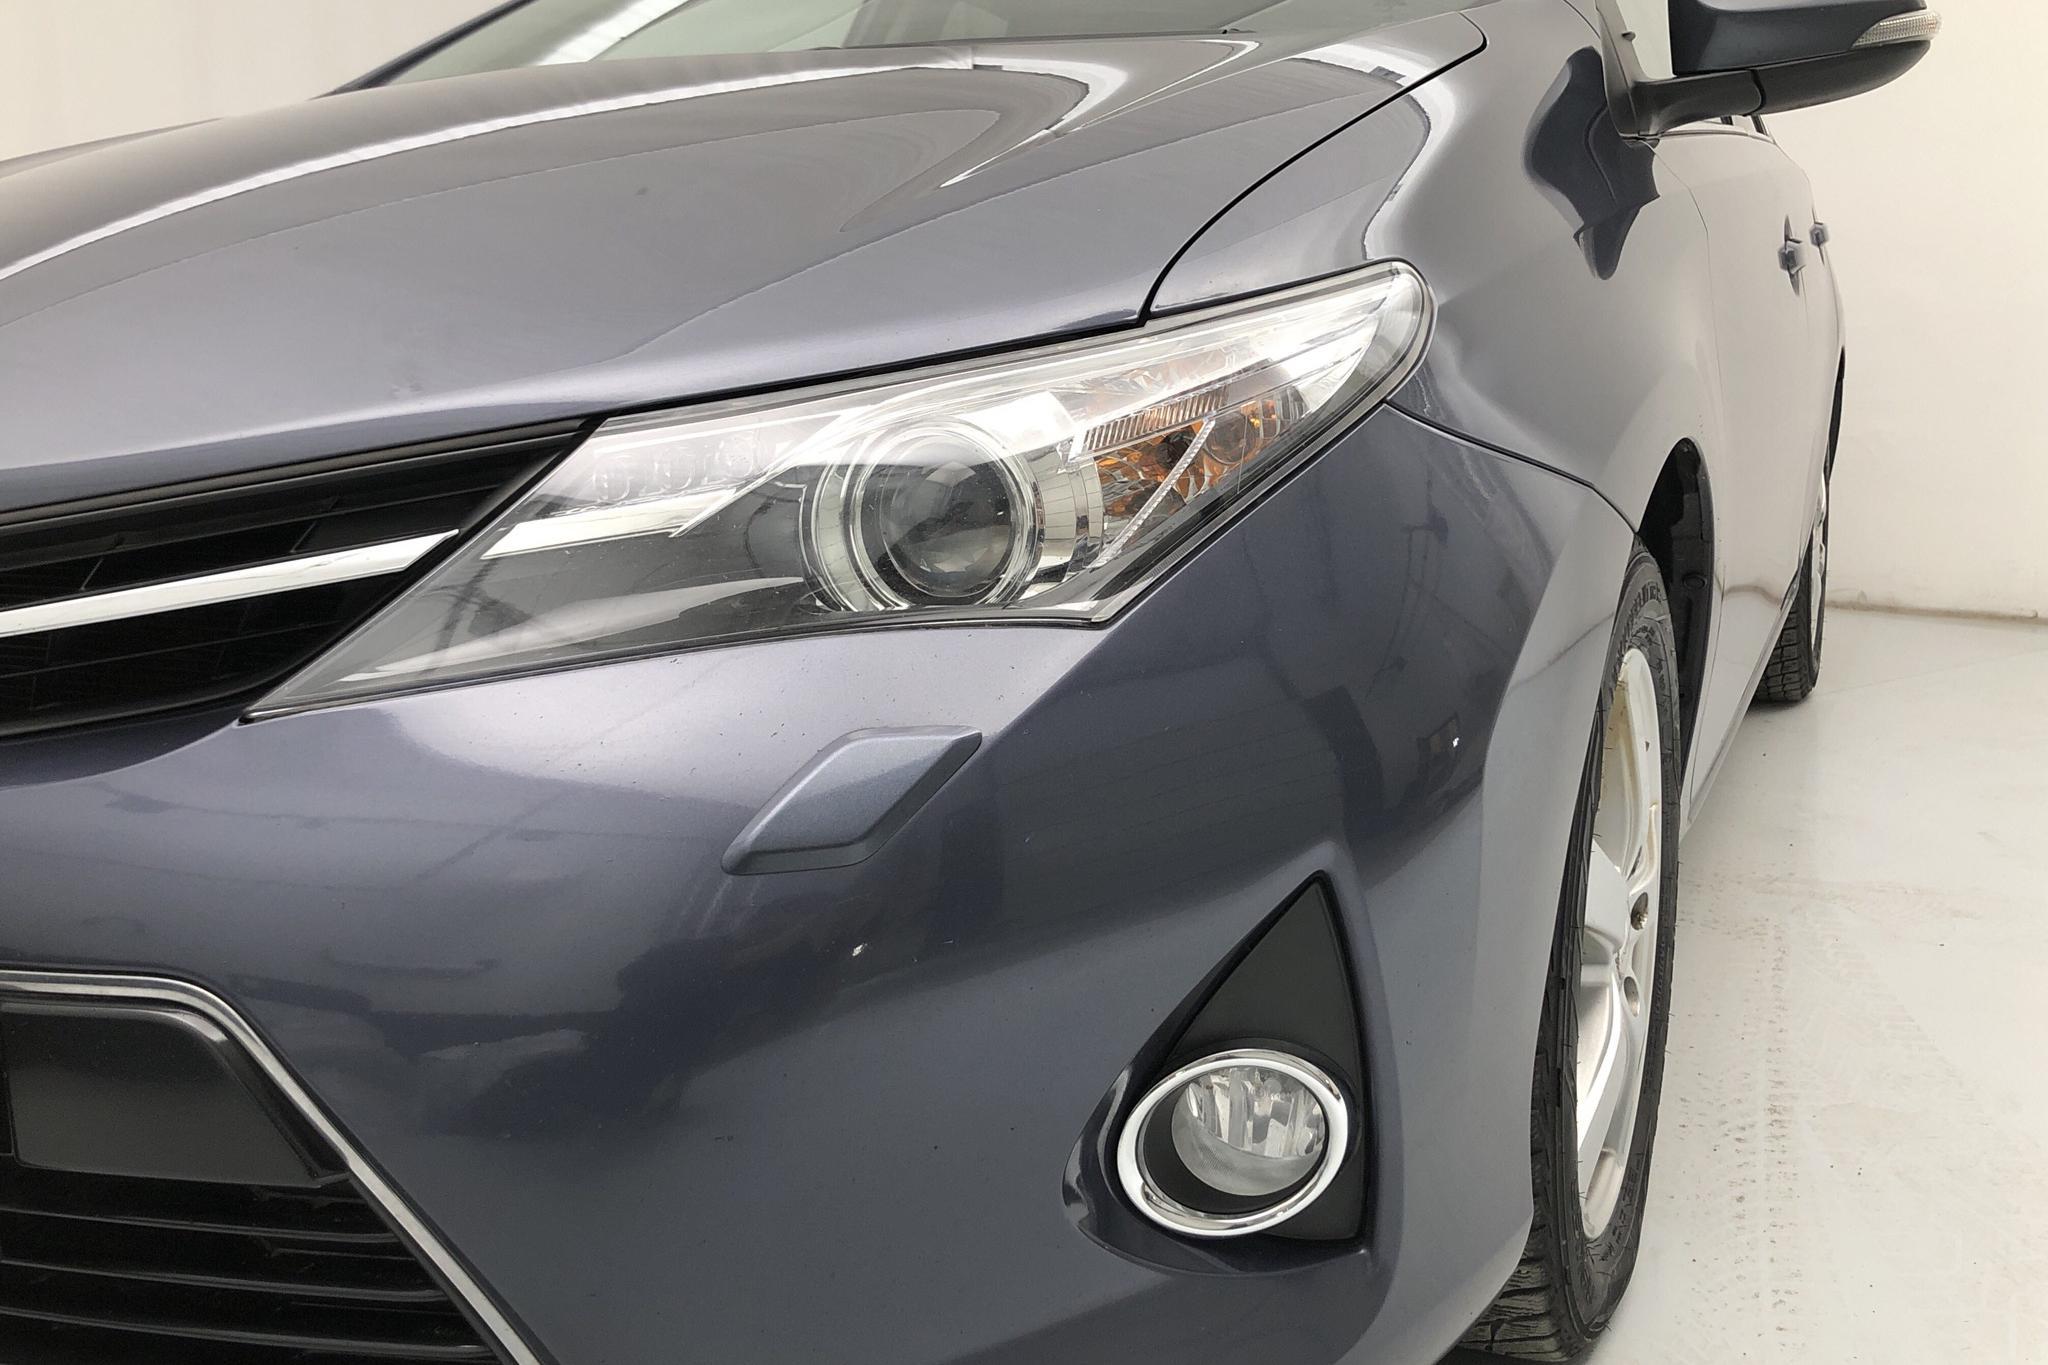 Toyota Auris 1.6 Valvematic 5dr (132hk) - 182 950 km - Manual - Dark Blue - 2015